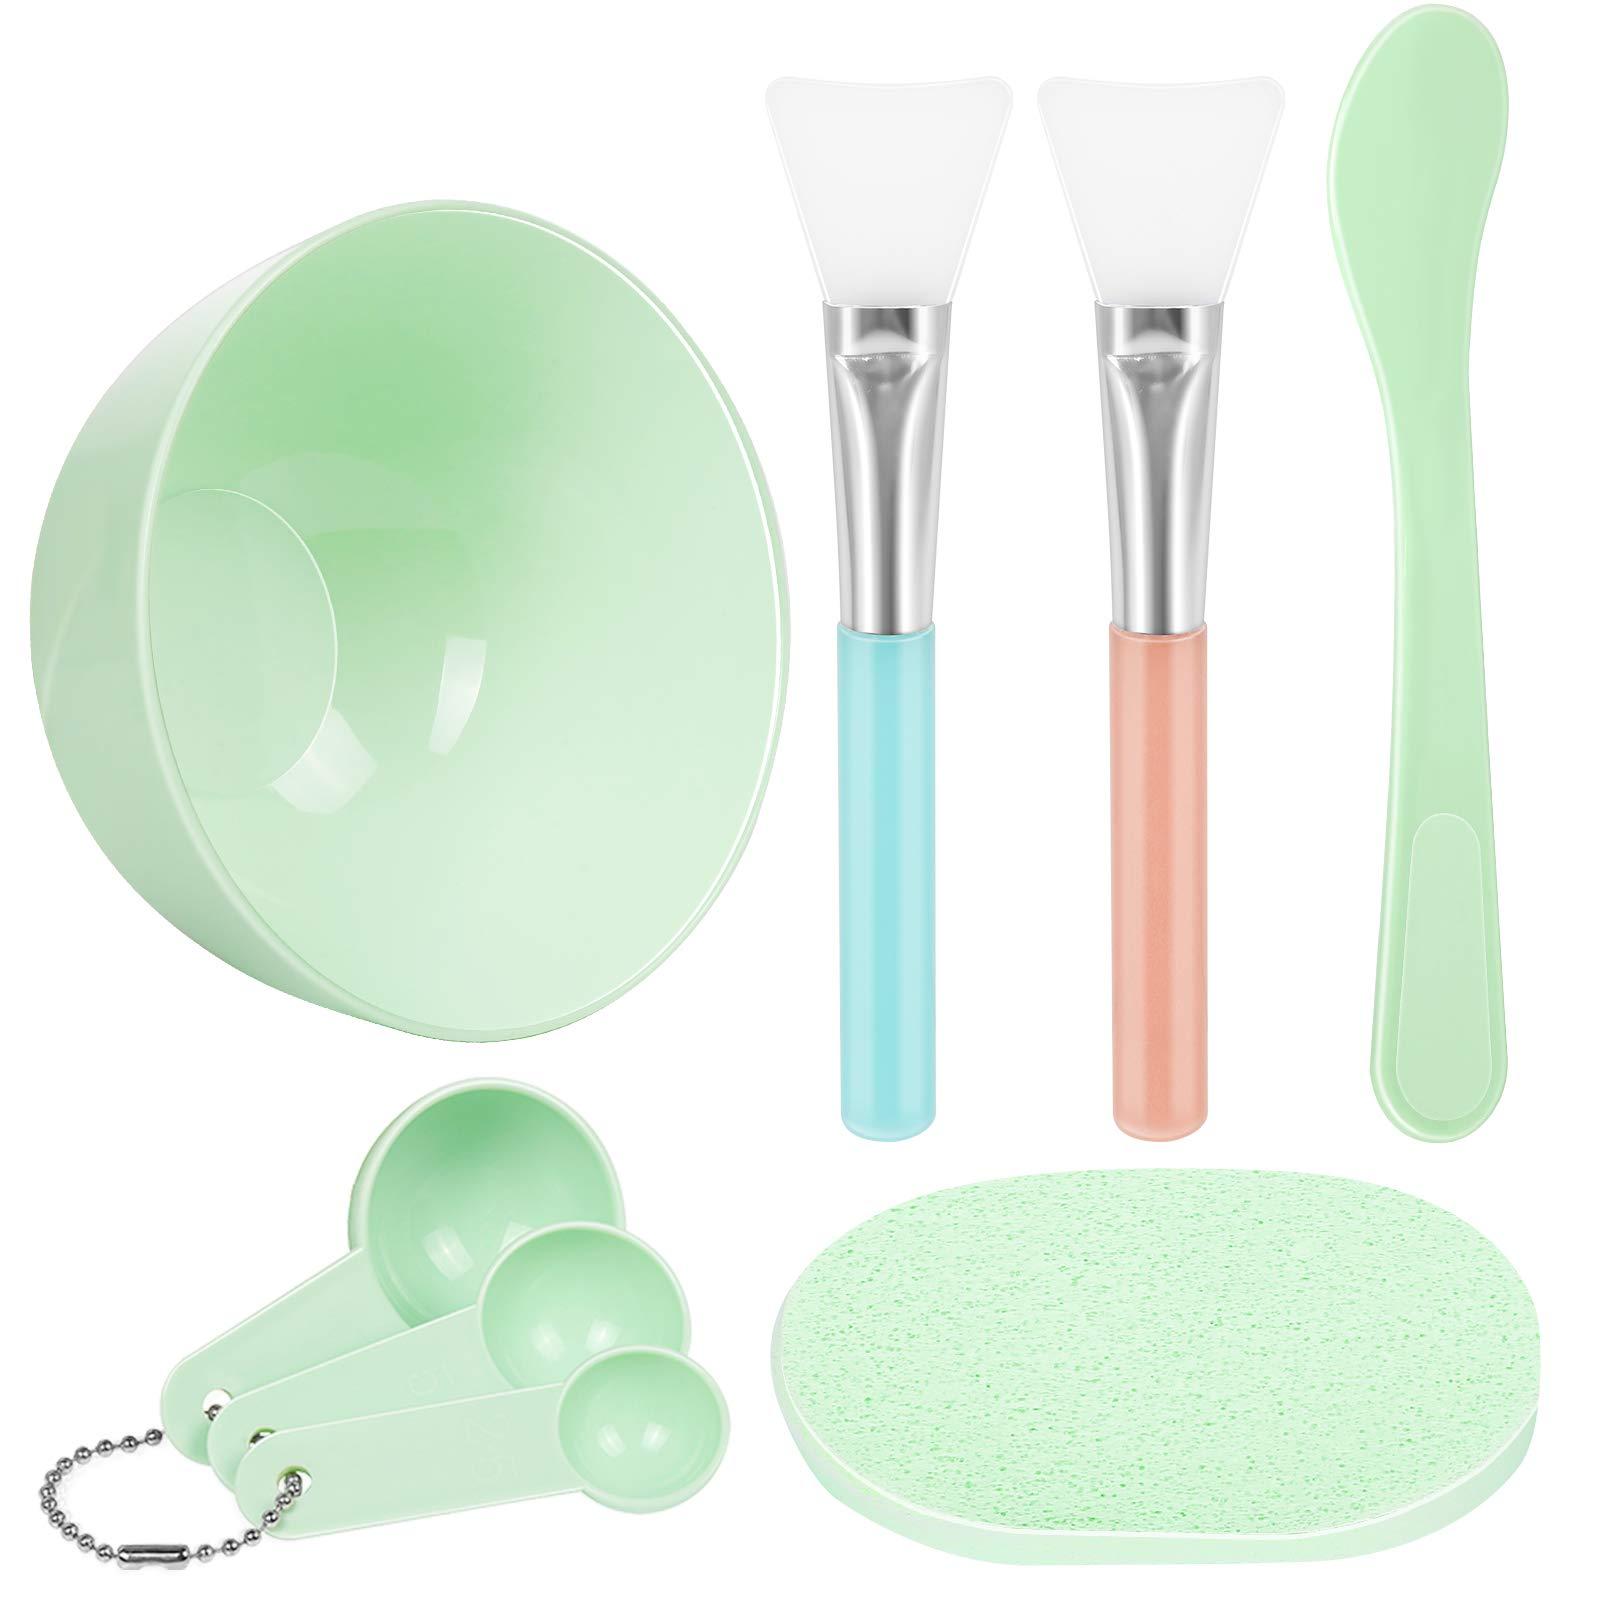 Facial Mask Mixing Bowl Set, Teenitor DIY Facemask Mixing Tool Kit with Silicon Face Mask Brush Facial Mask Bowl Stick Spatula Gauges Puff, Pack of 8, Green